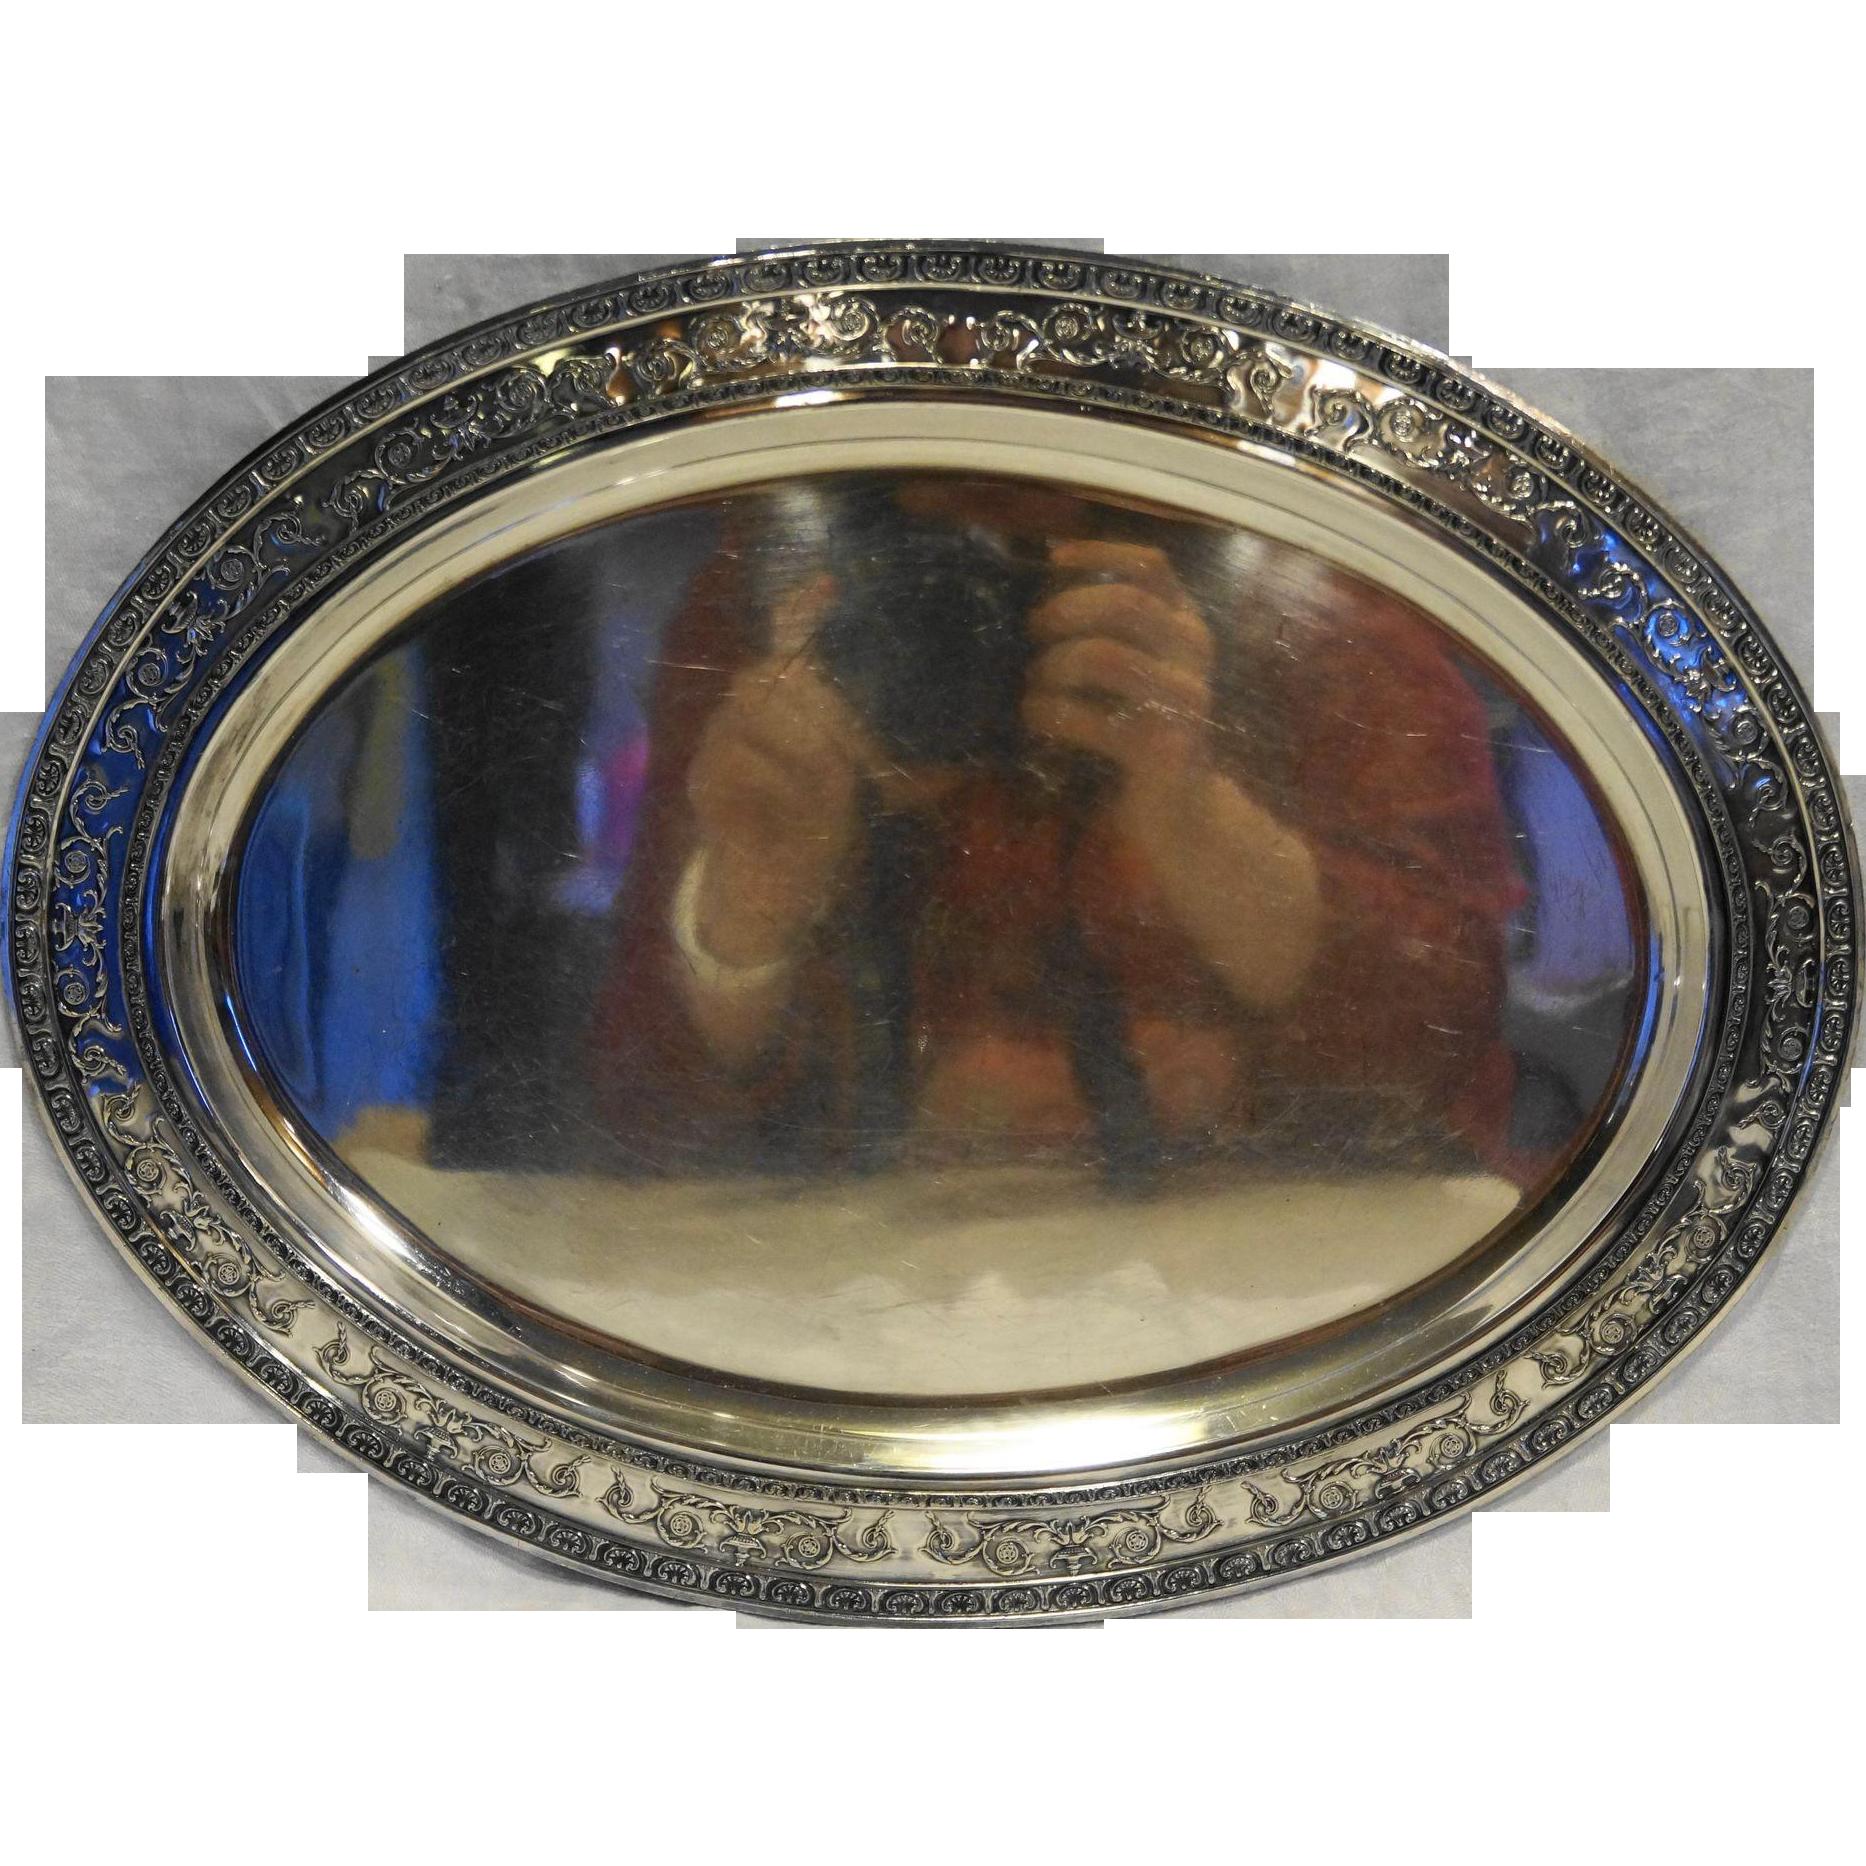 Silverplate Oval Platter Embossed Shells Urns Scrolls Rim 17 IN